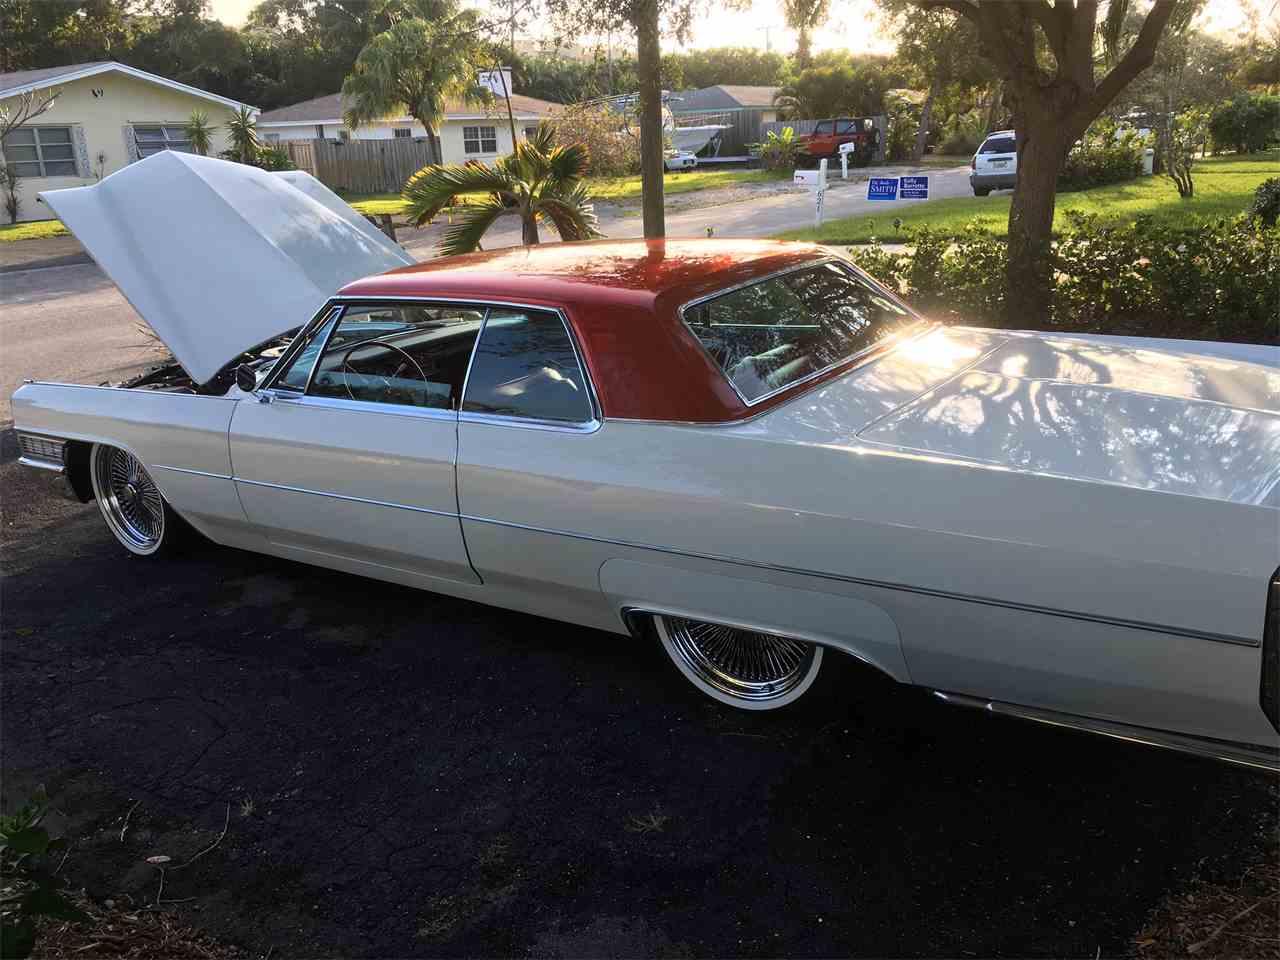 1965 Cadillac Coupe Deville For Sale Classiccars Com